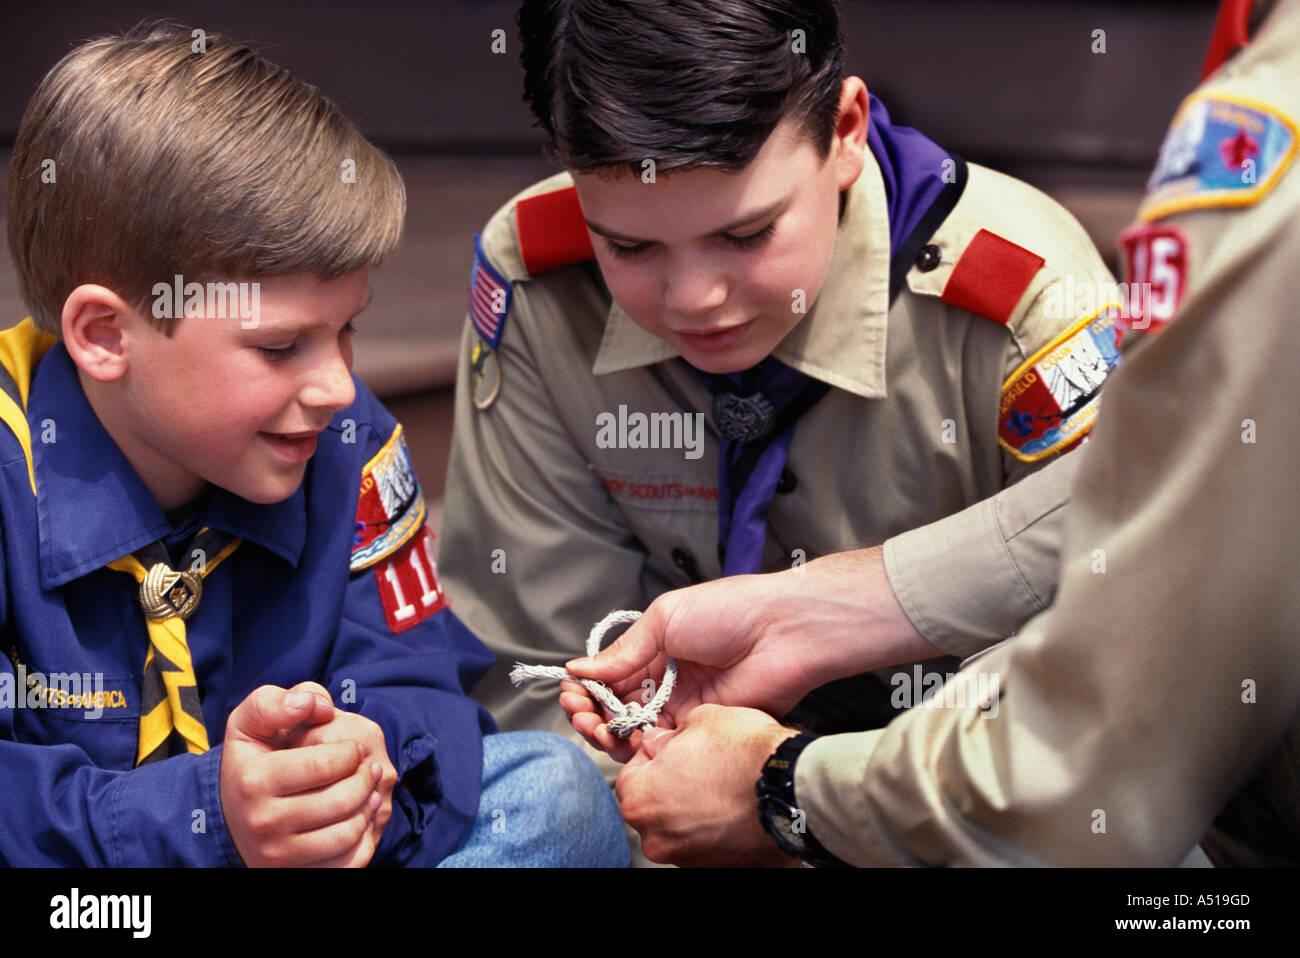 Boy Scout Teaches Weblo And Cub Scout To Tie Knots User